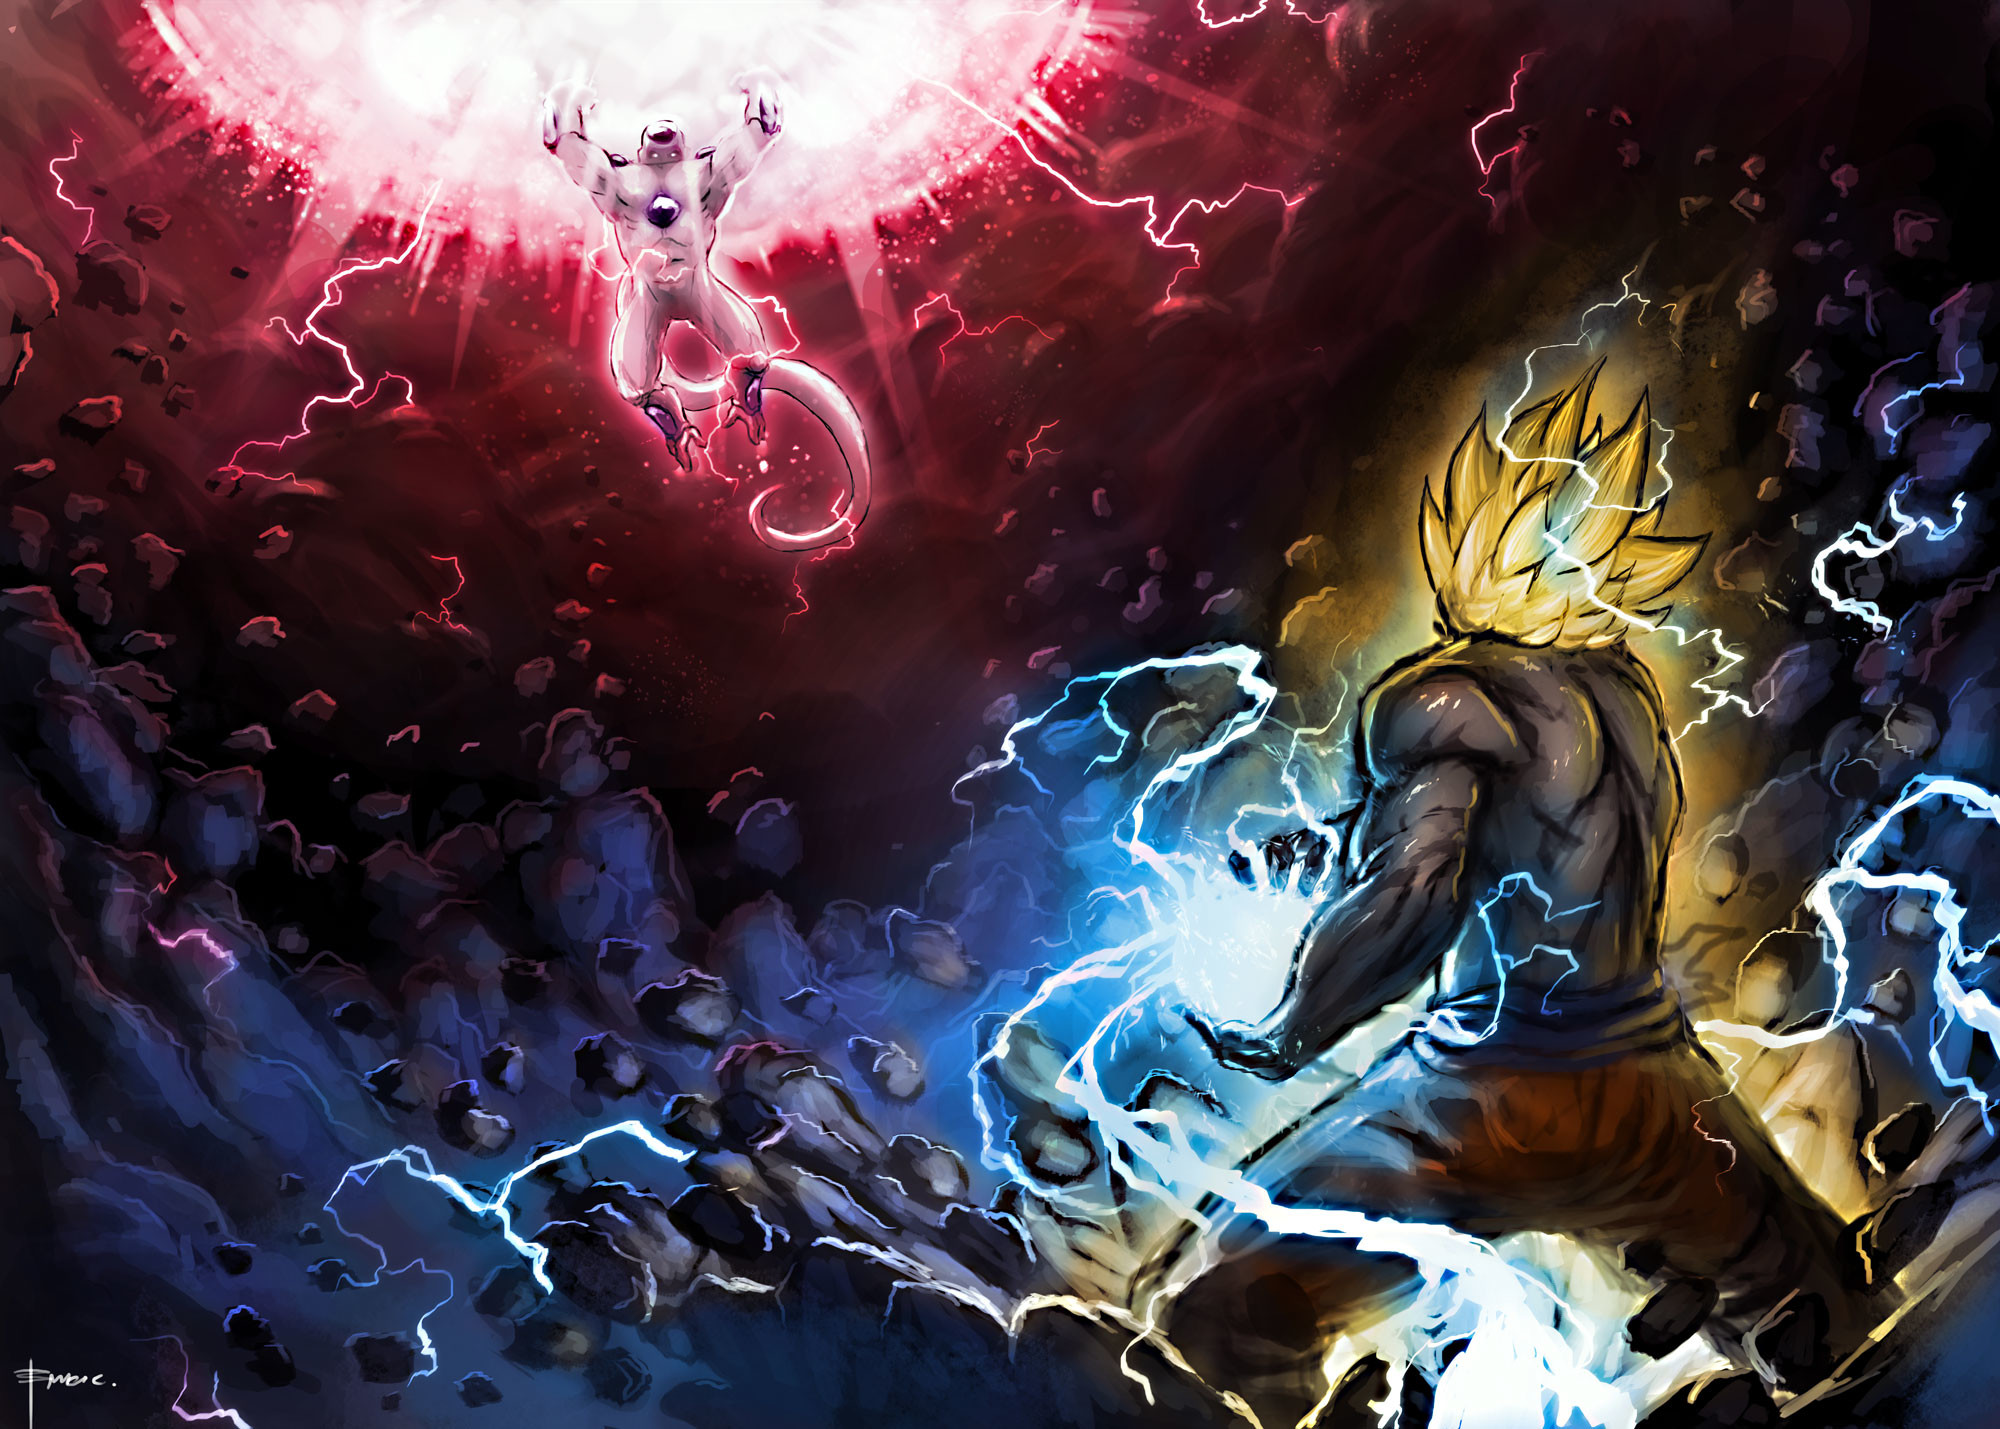 Dragonballz Goku vs Frieza HD Wallpapers